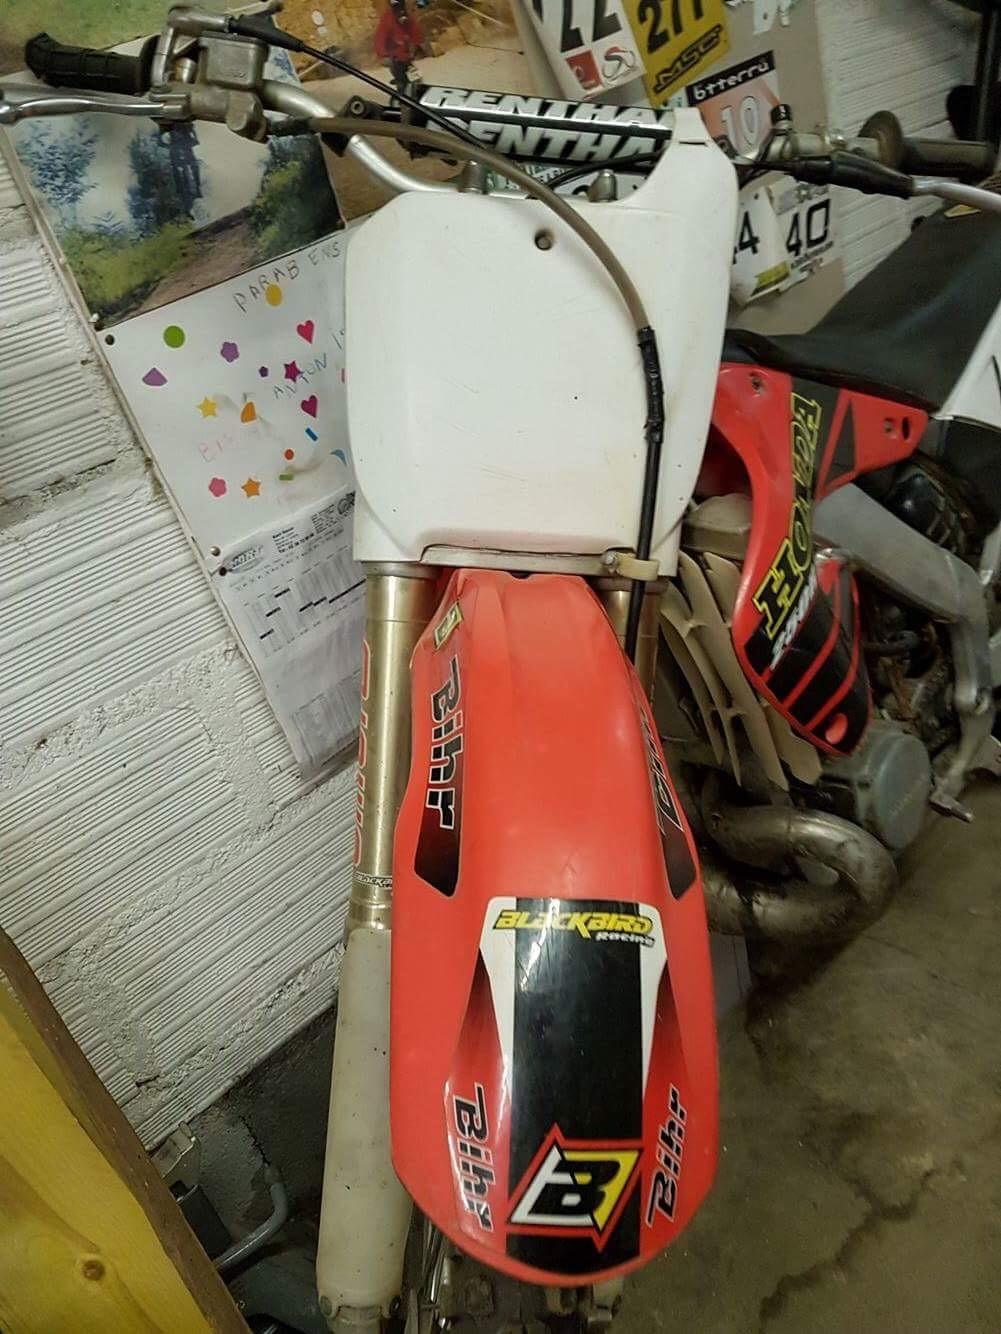 B099597F-2ADA-4541-8A40-9782359A15B6 - Godcho - Motocross Pictures - Vital MX